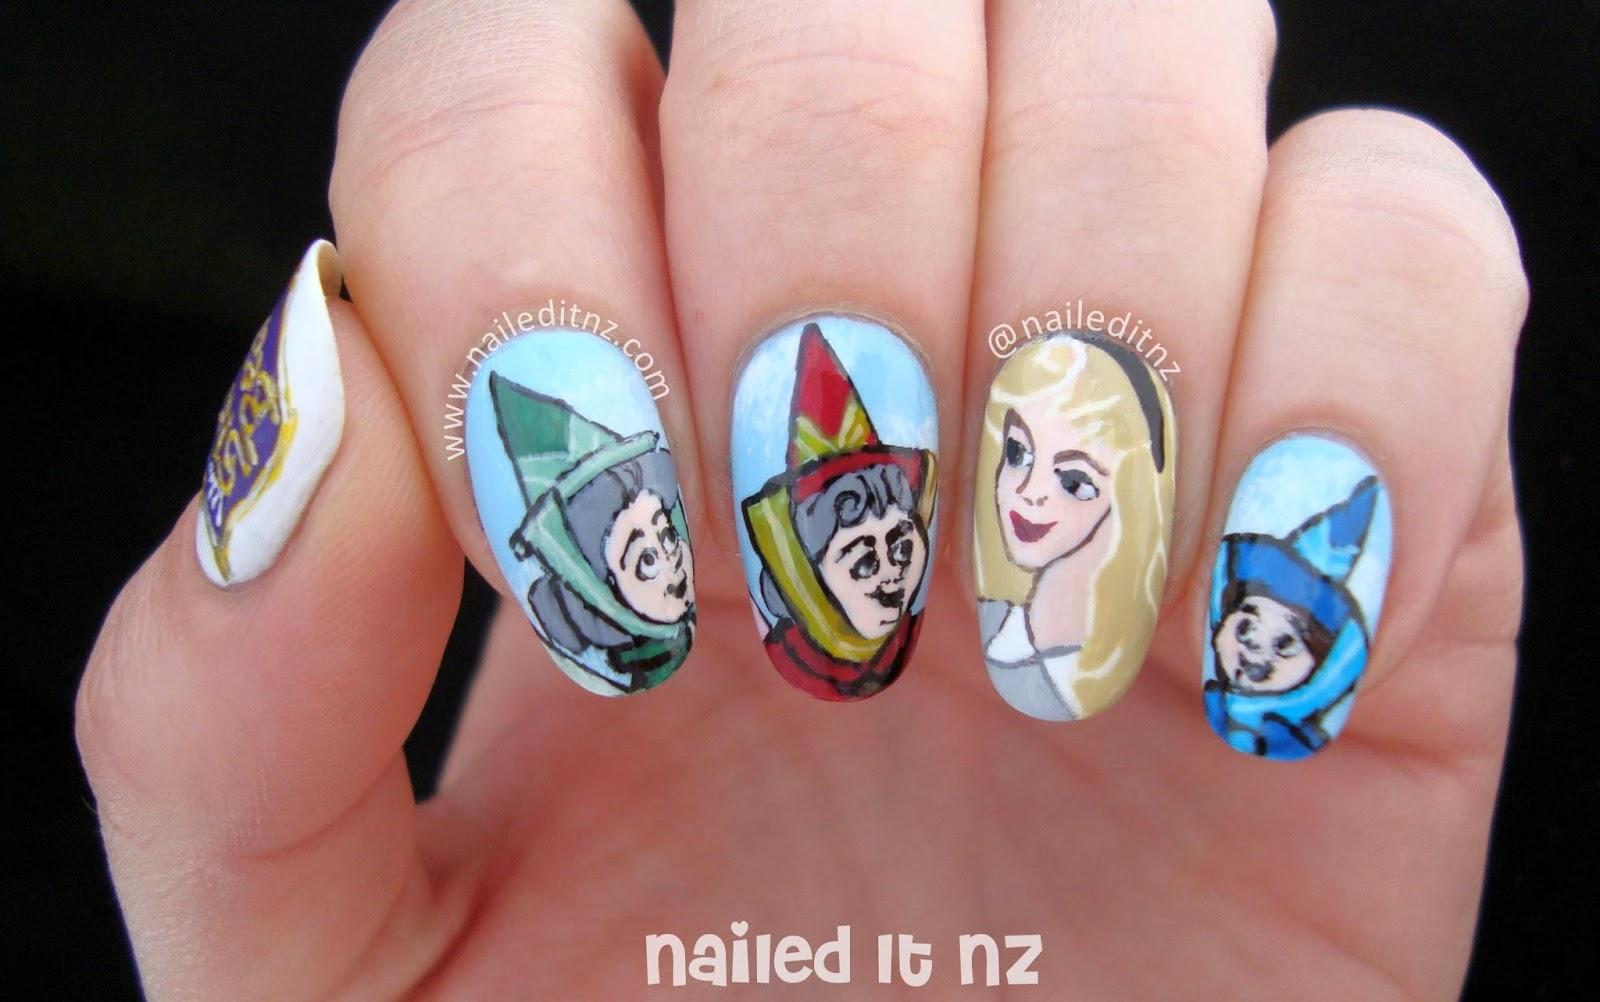 Disney Nail Art 7 Sleeping Beauty Maleficent